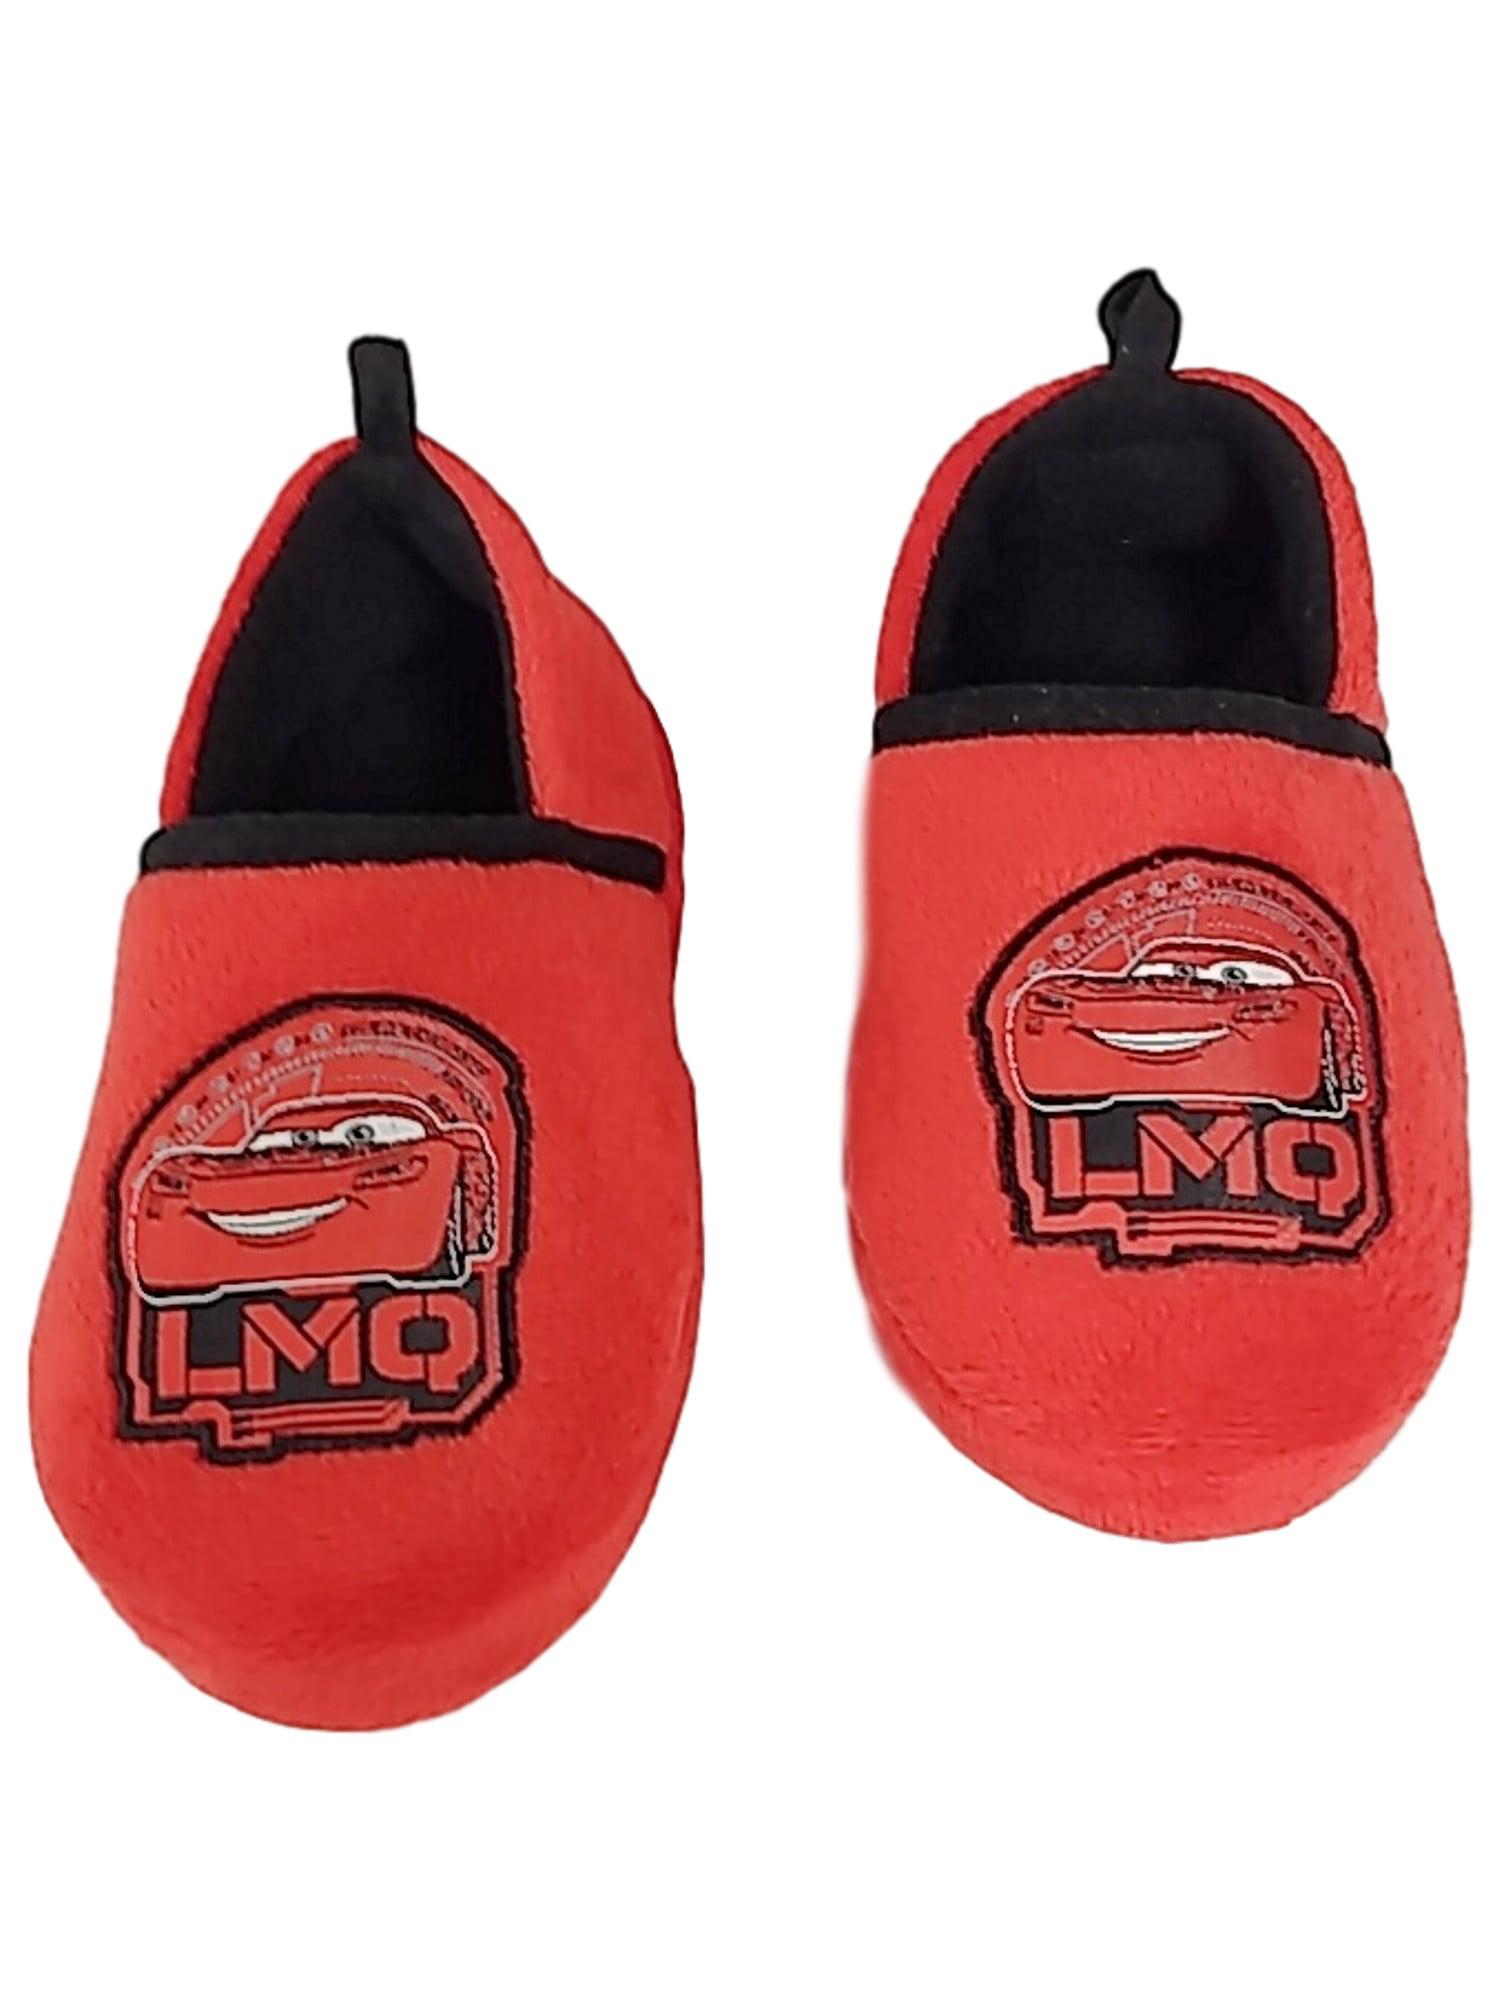 Toddler Boys Red Disney Cars Slippers